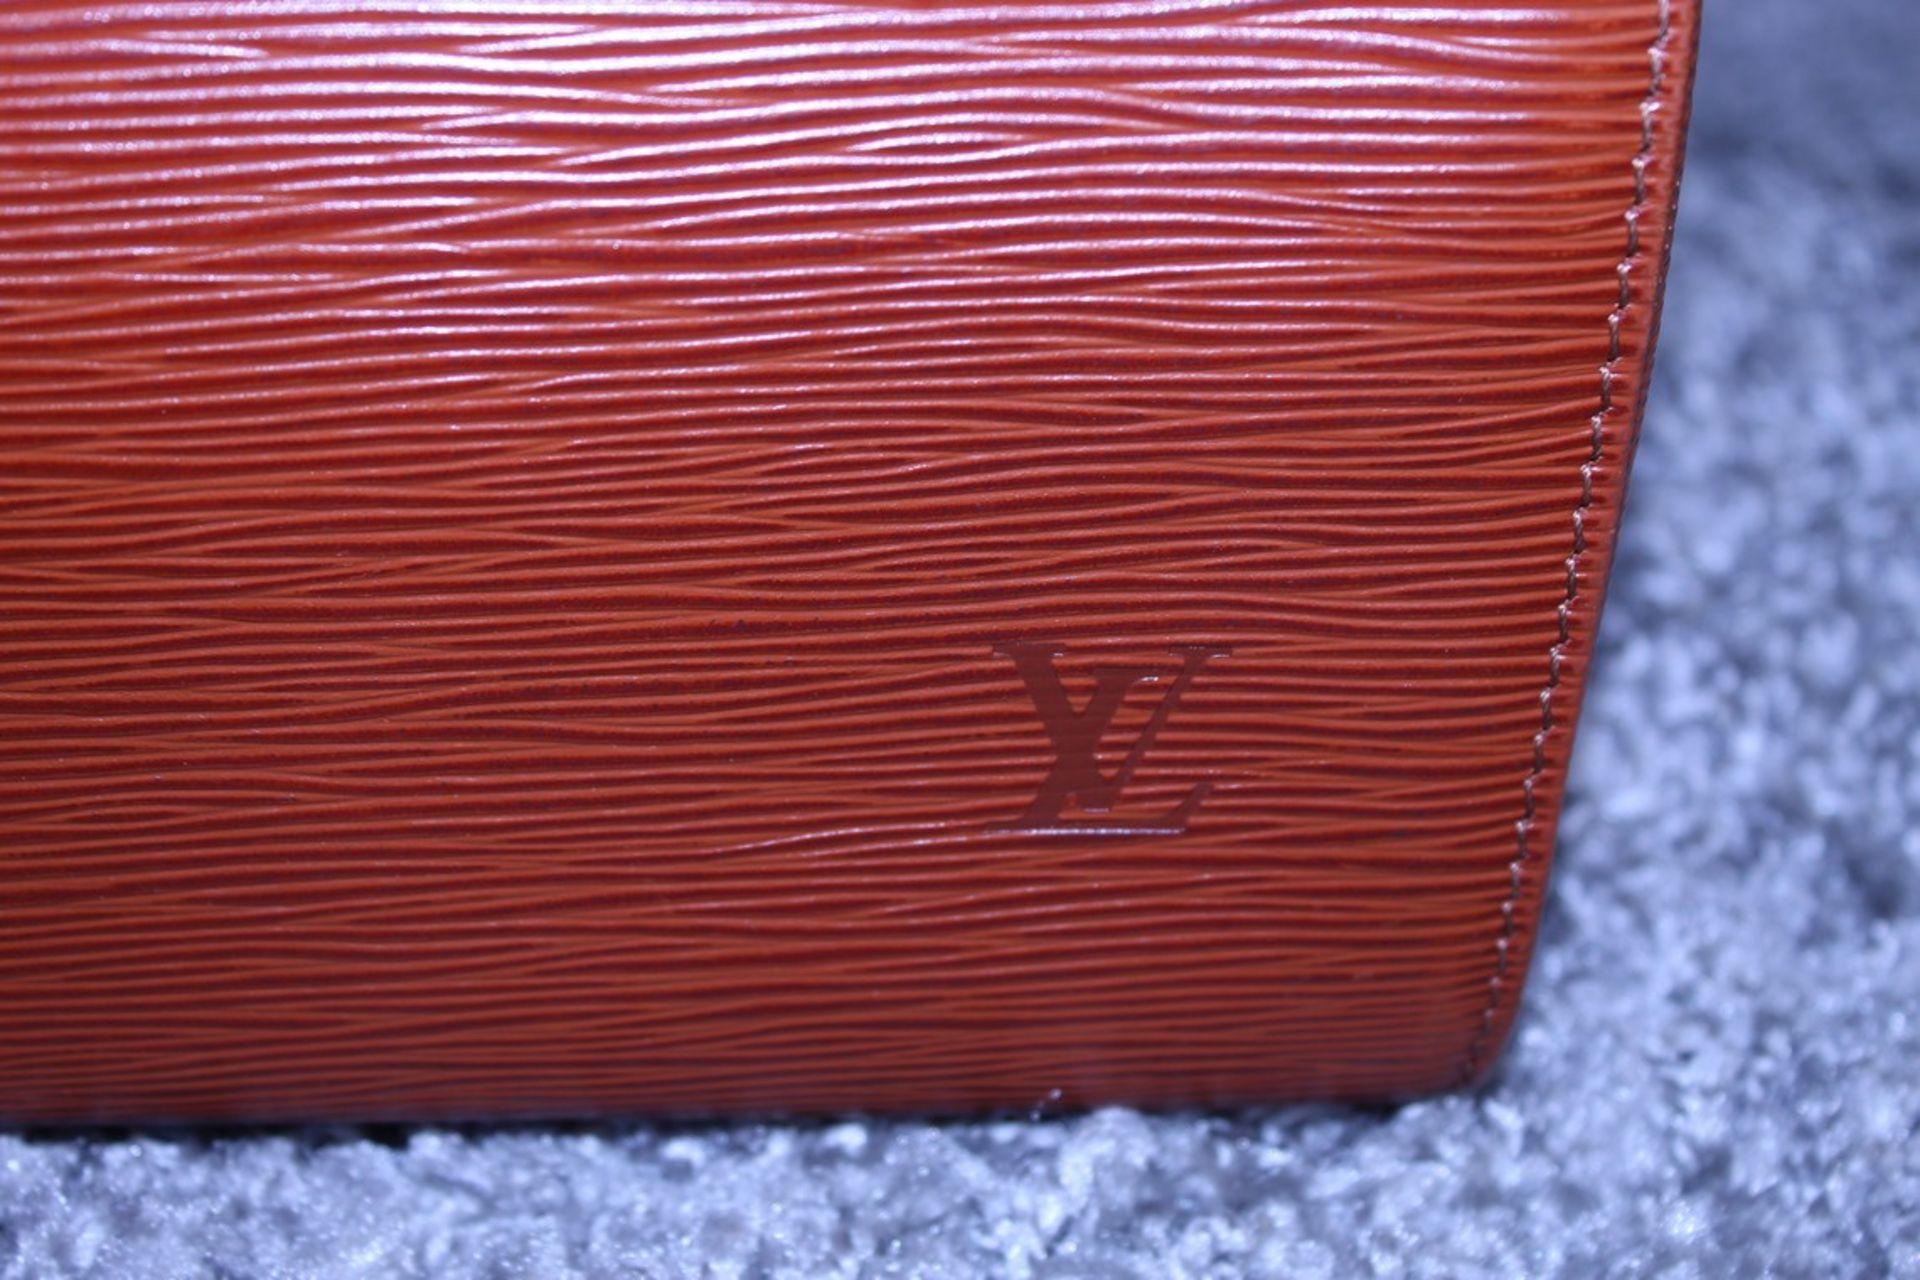 RRP £1,000 Louis Vuitton Speedy 25 Handbag, Tan Epi Calf Leather 27X19X15Cm (Production Code Vi1922) - Image 4 of 4